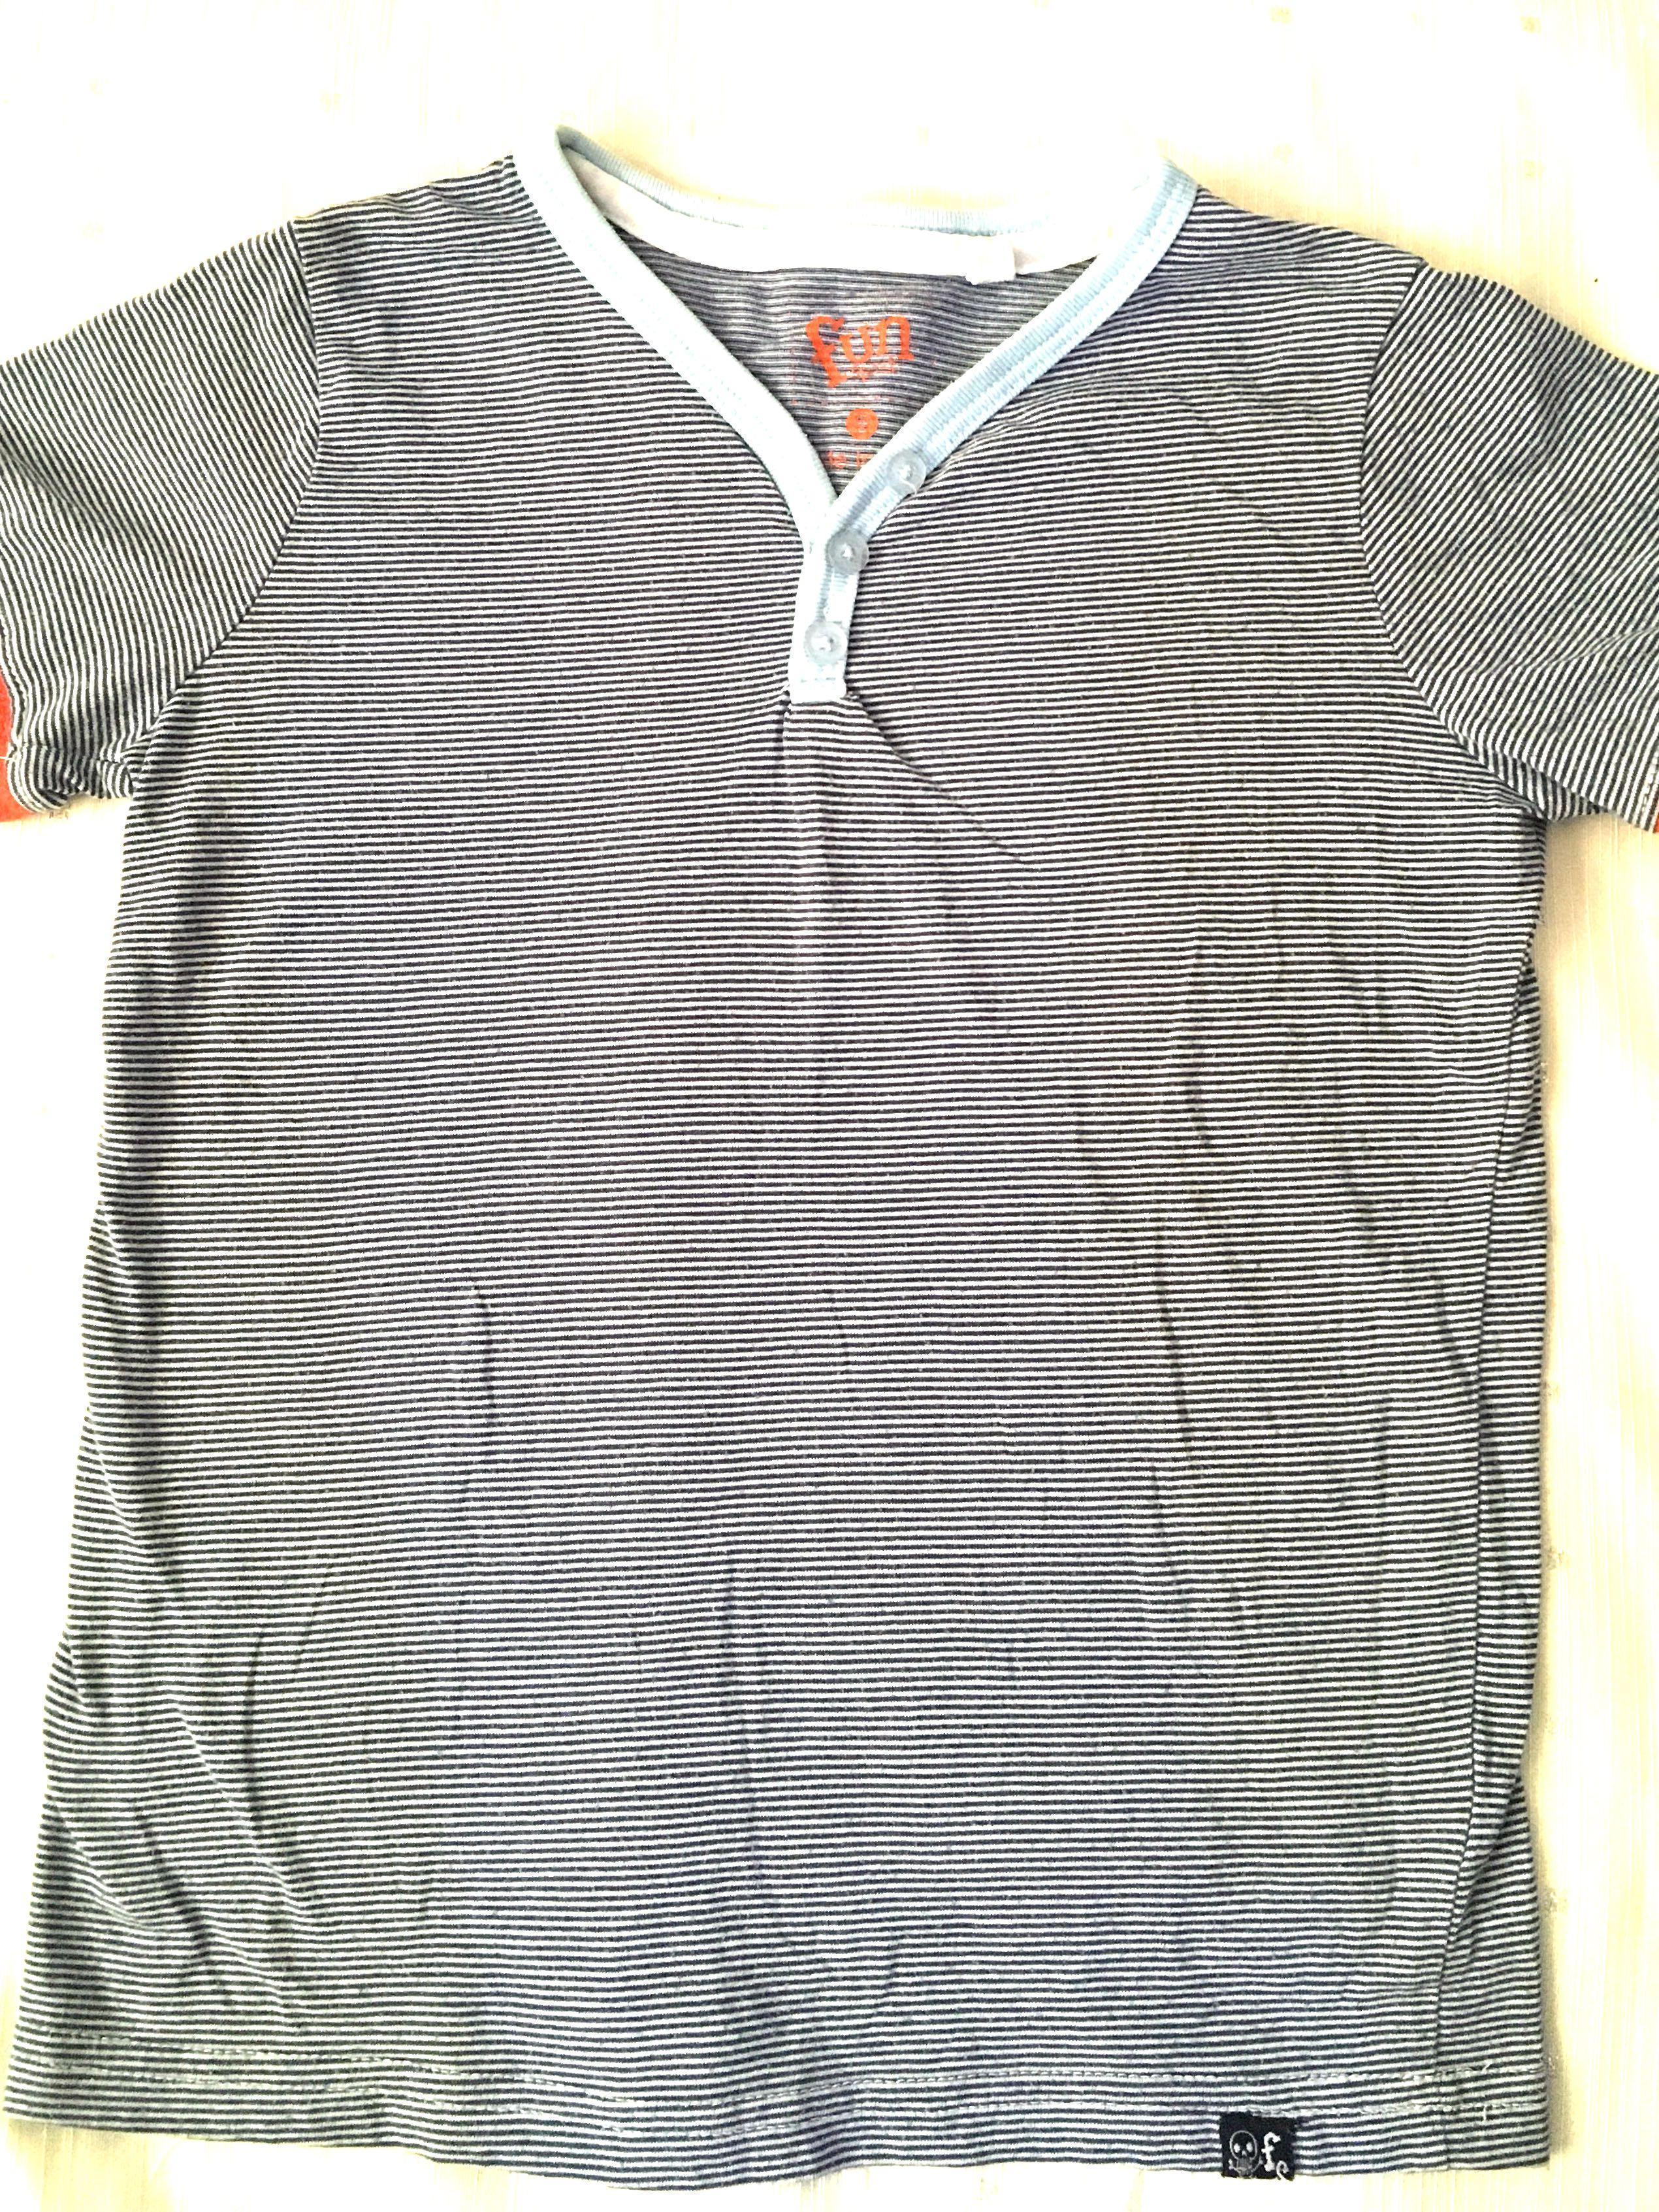 ac5675b2bc Fun Boys Striped Cotton T-Shirt Top Size 5 on Carousell